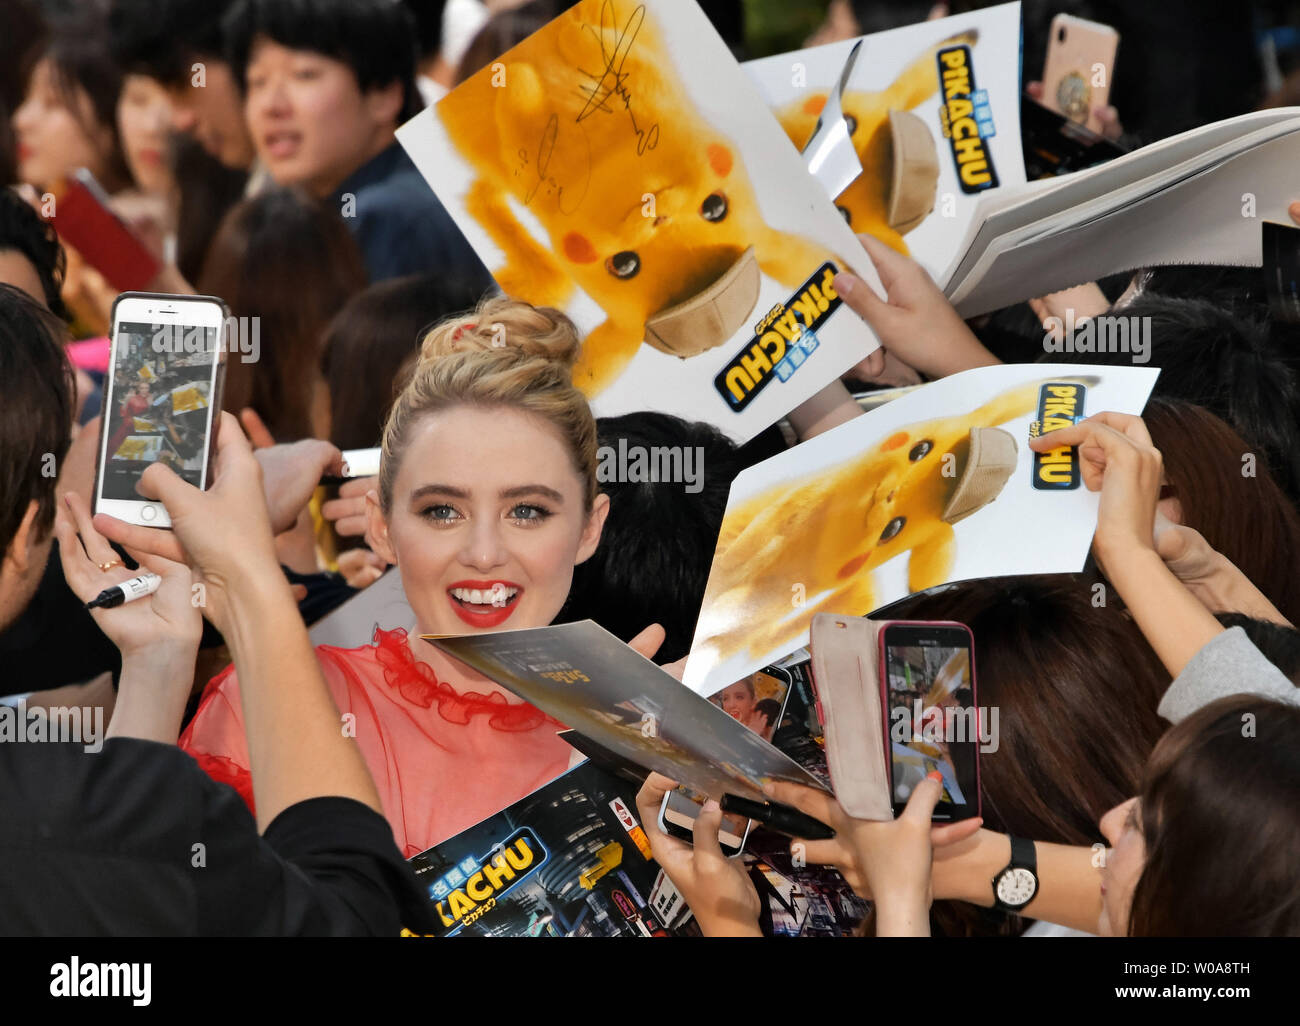 25 April Film Stock Photos & 25 April Film Stock Images - Page 3 - Alamy